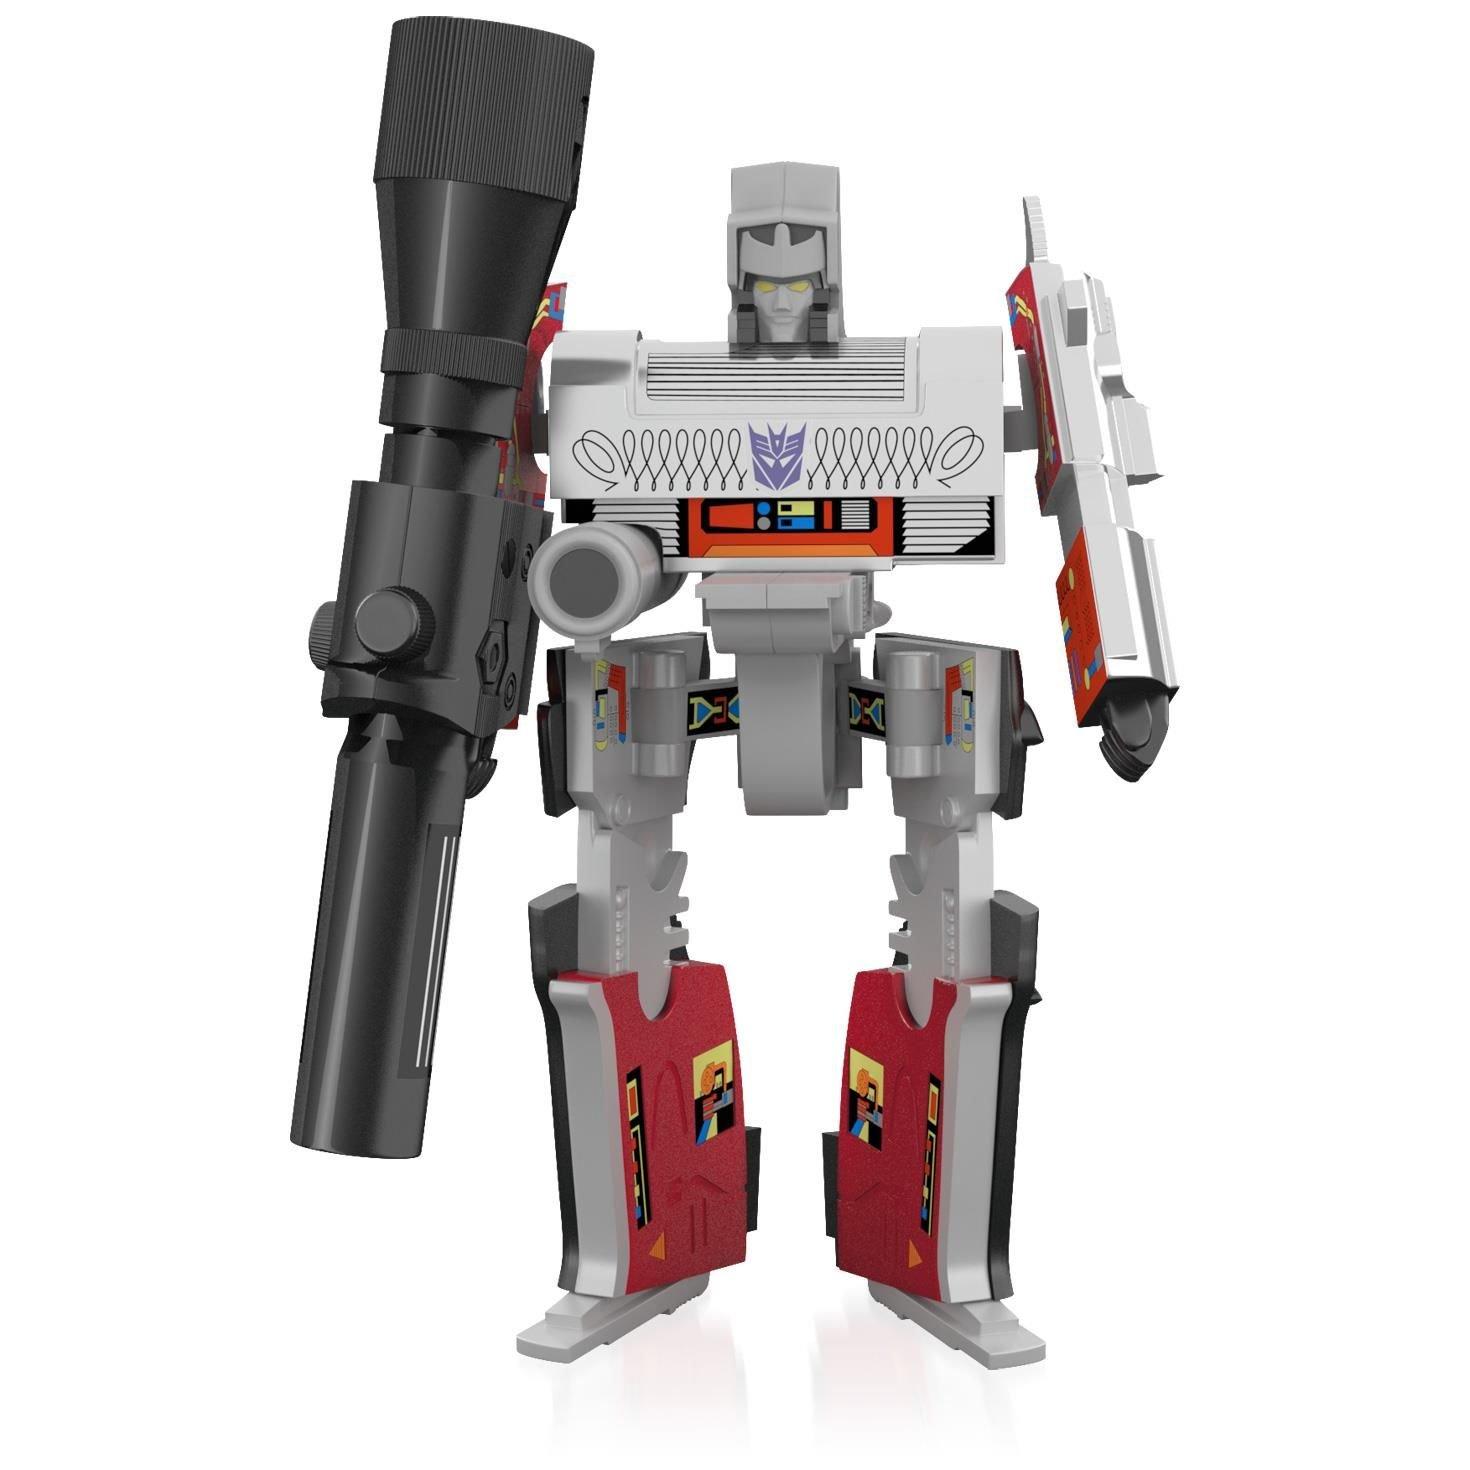 Amazon.com: Hasbro - Transformers - Megatron Ornament 2015 ...